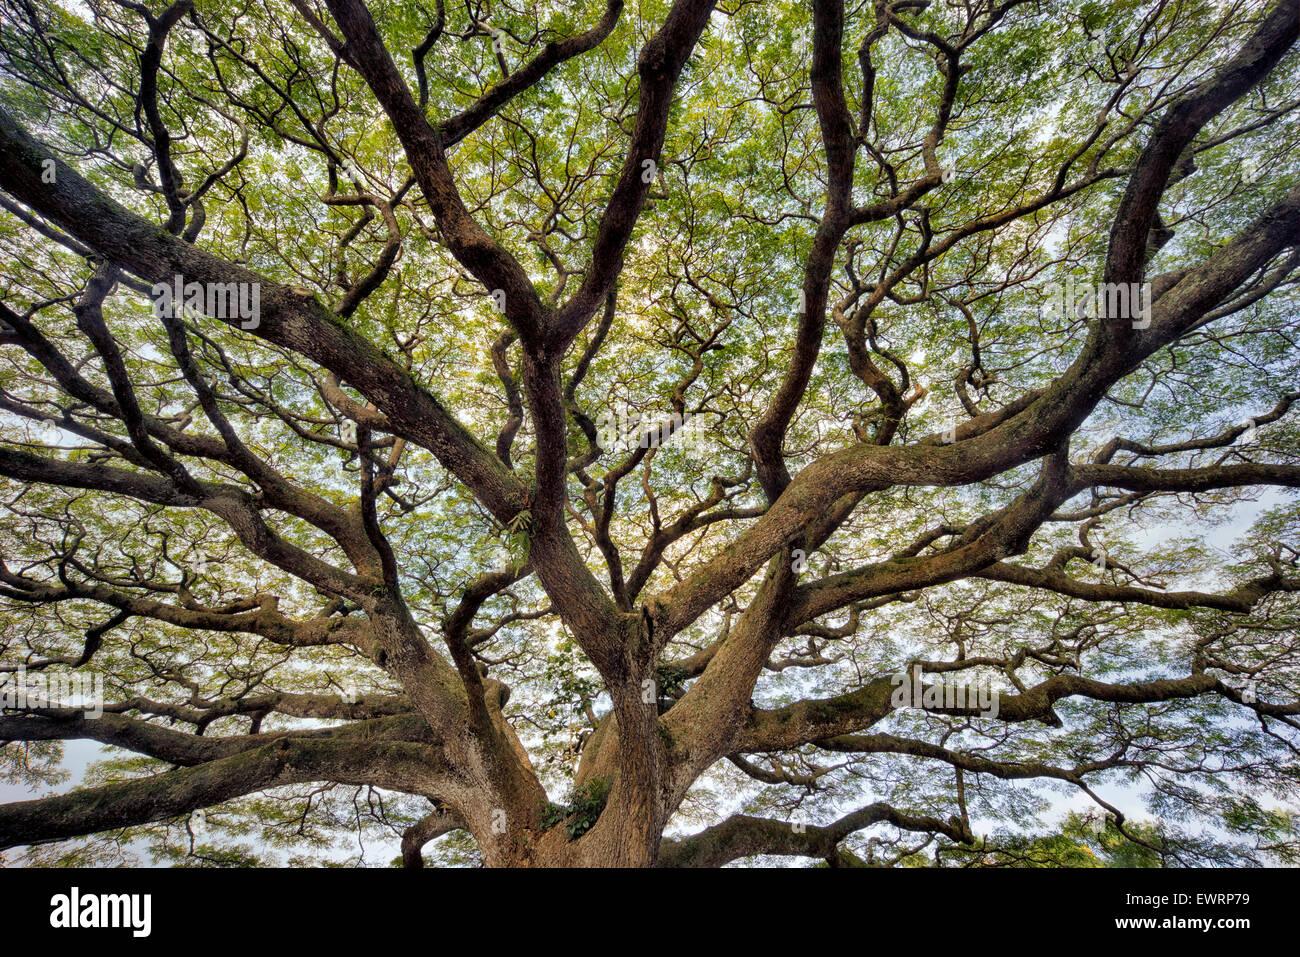 Großes Wild verzweigten Baum. Hawaii, Big Island Stockbild